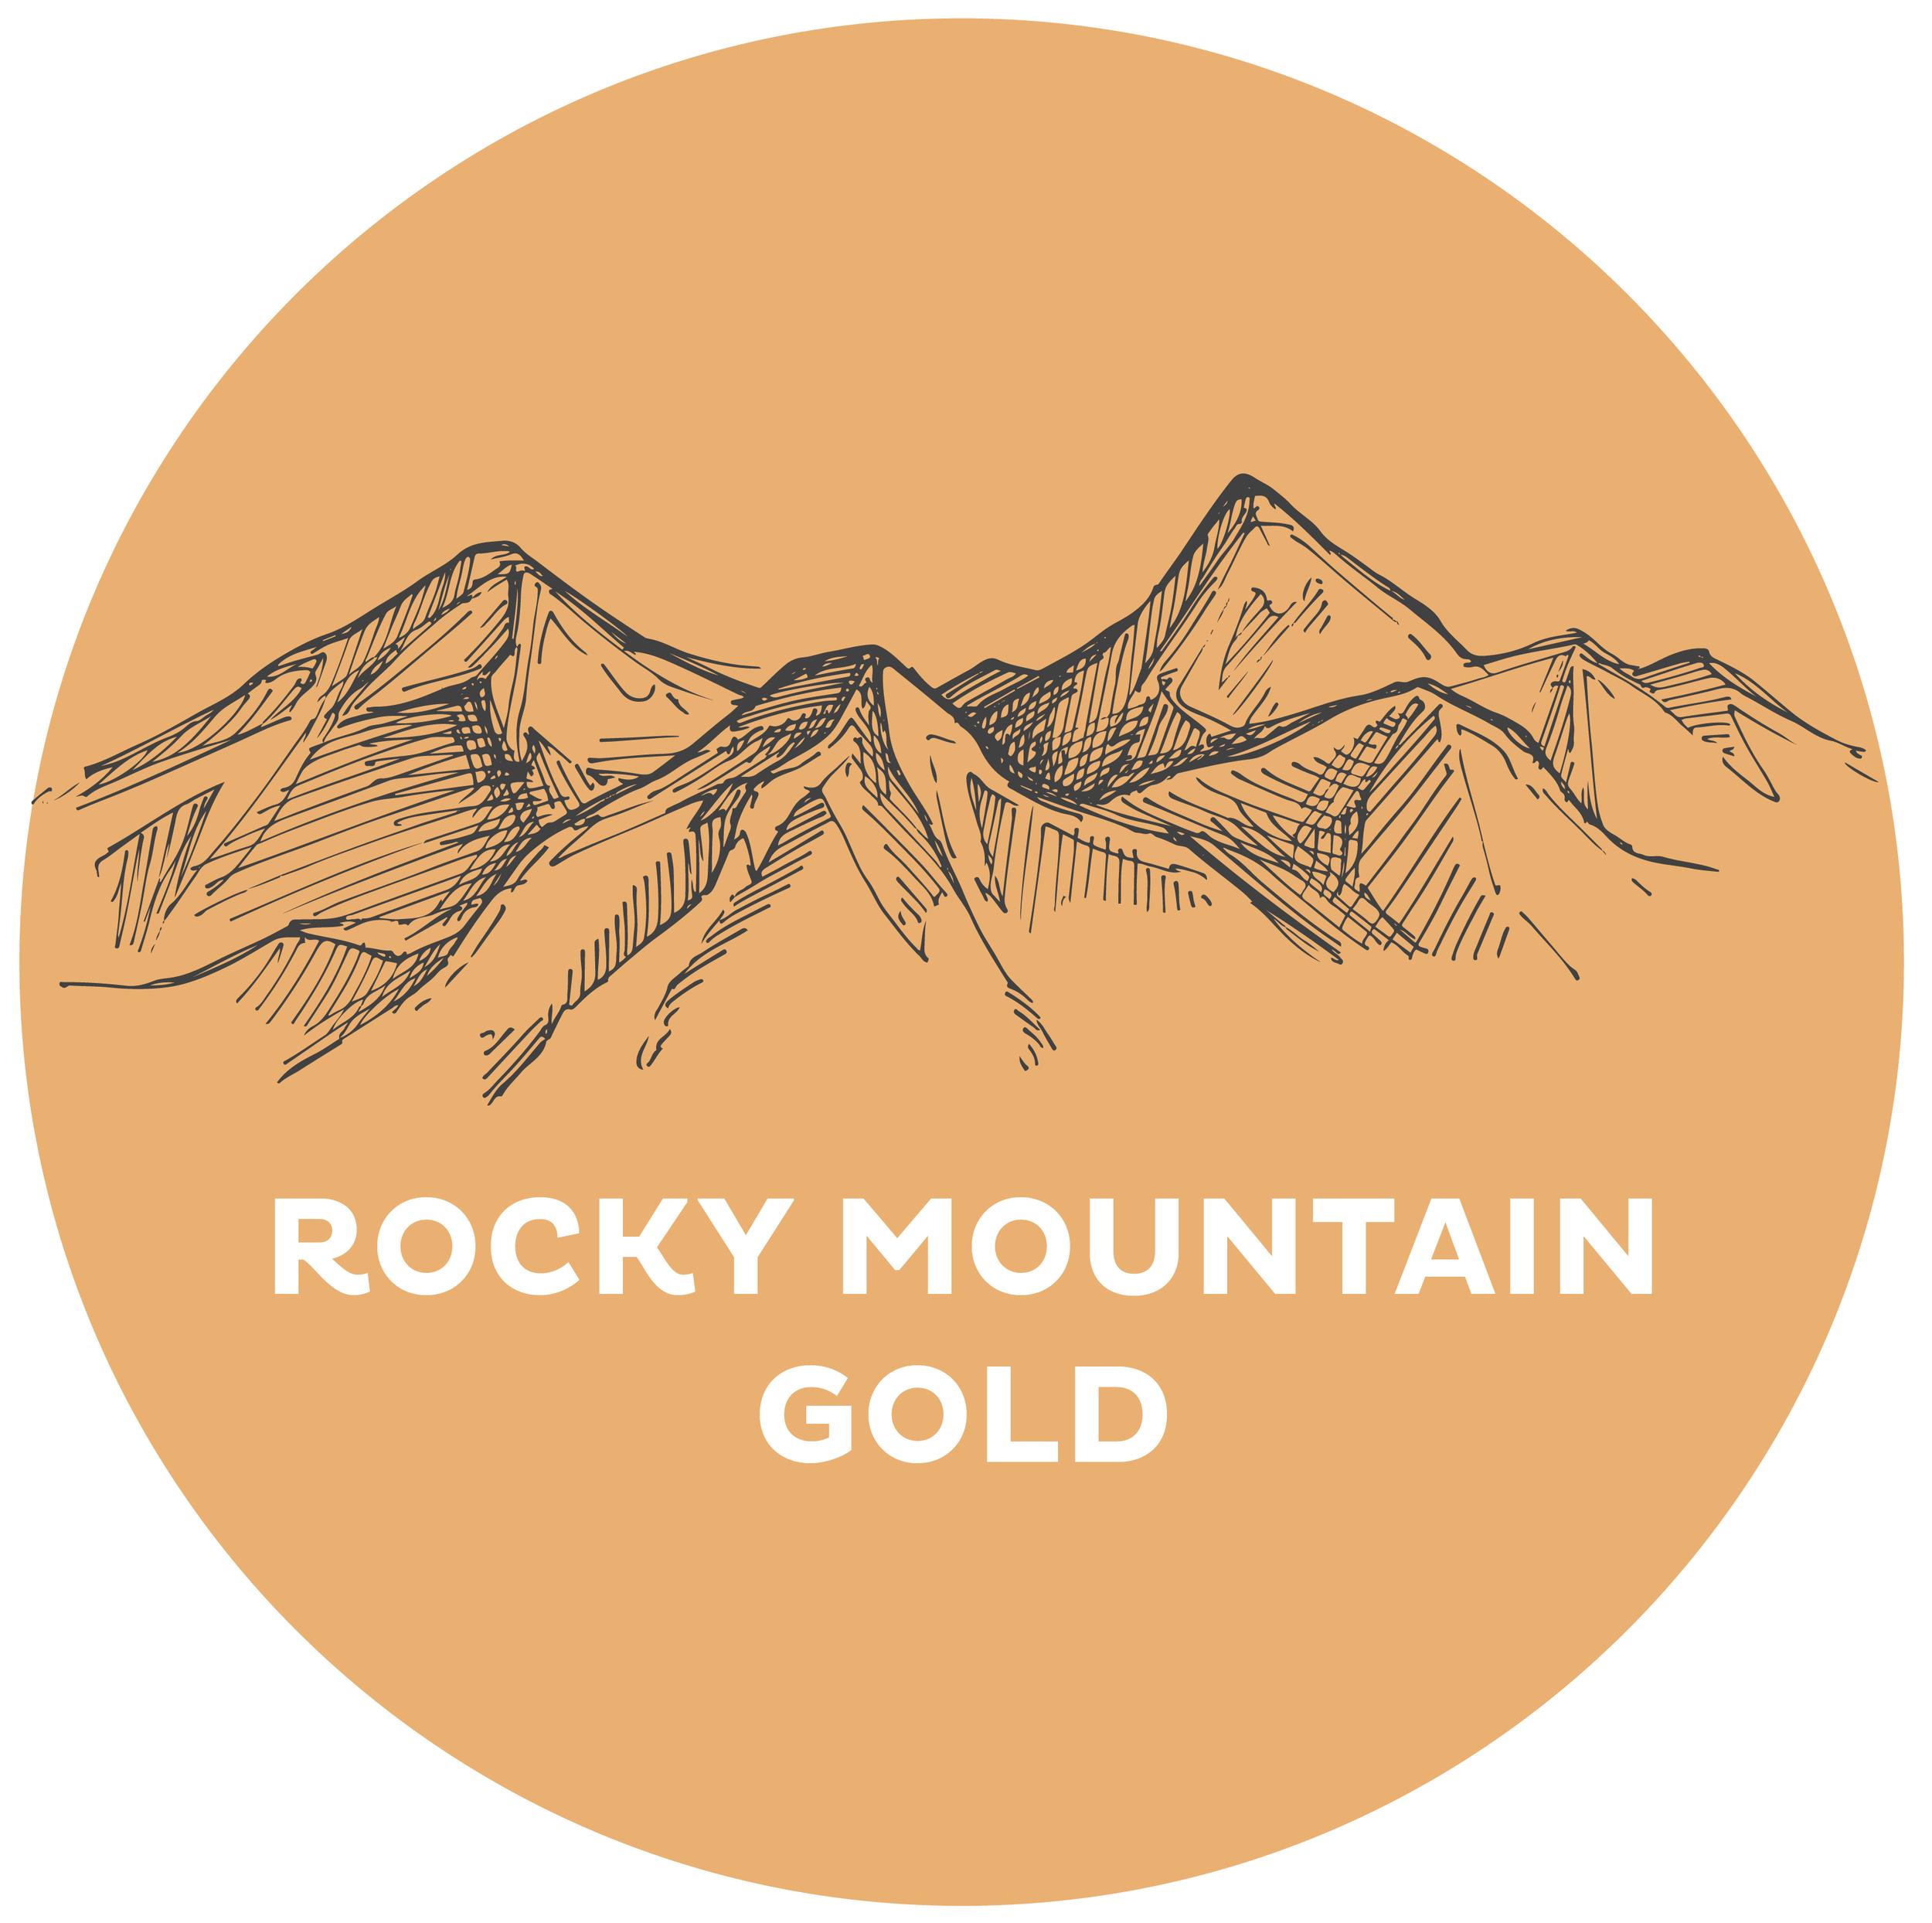 RockyMountainGold.png